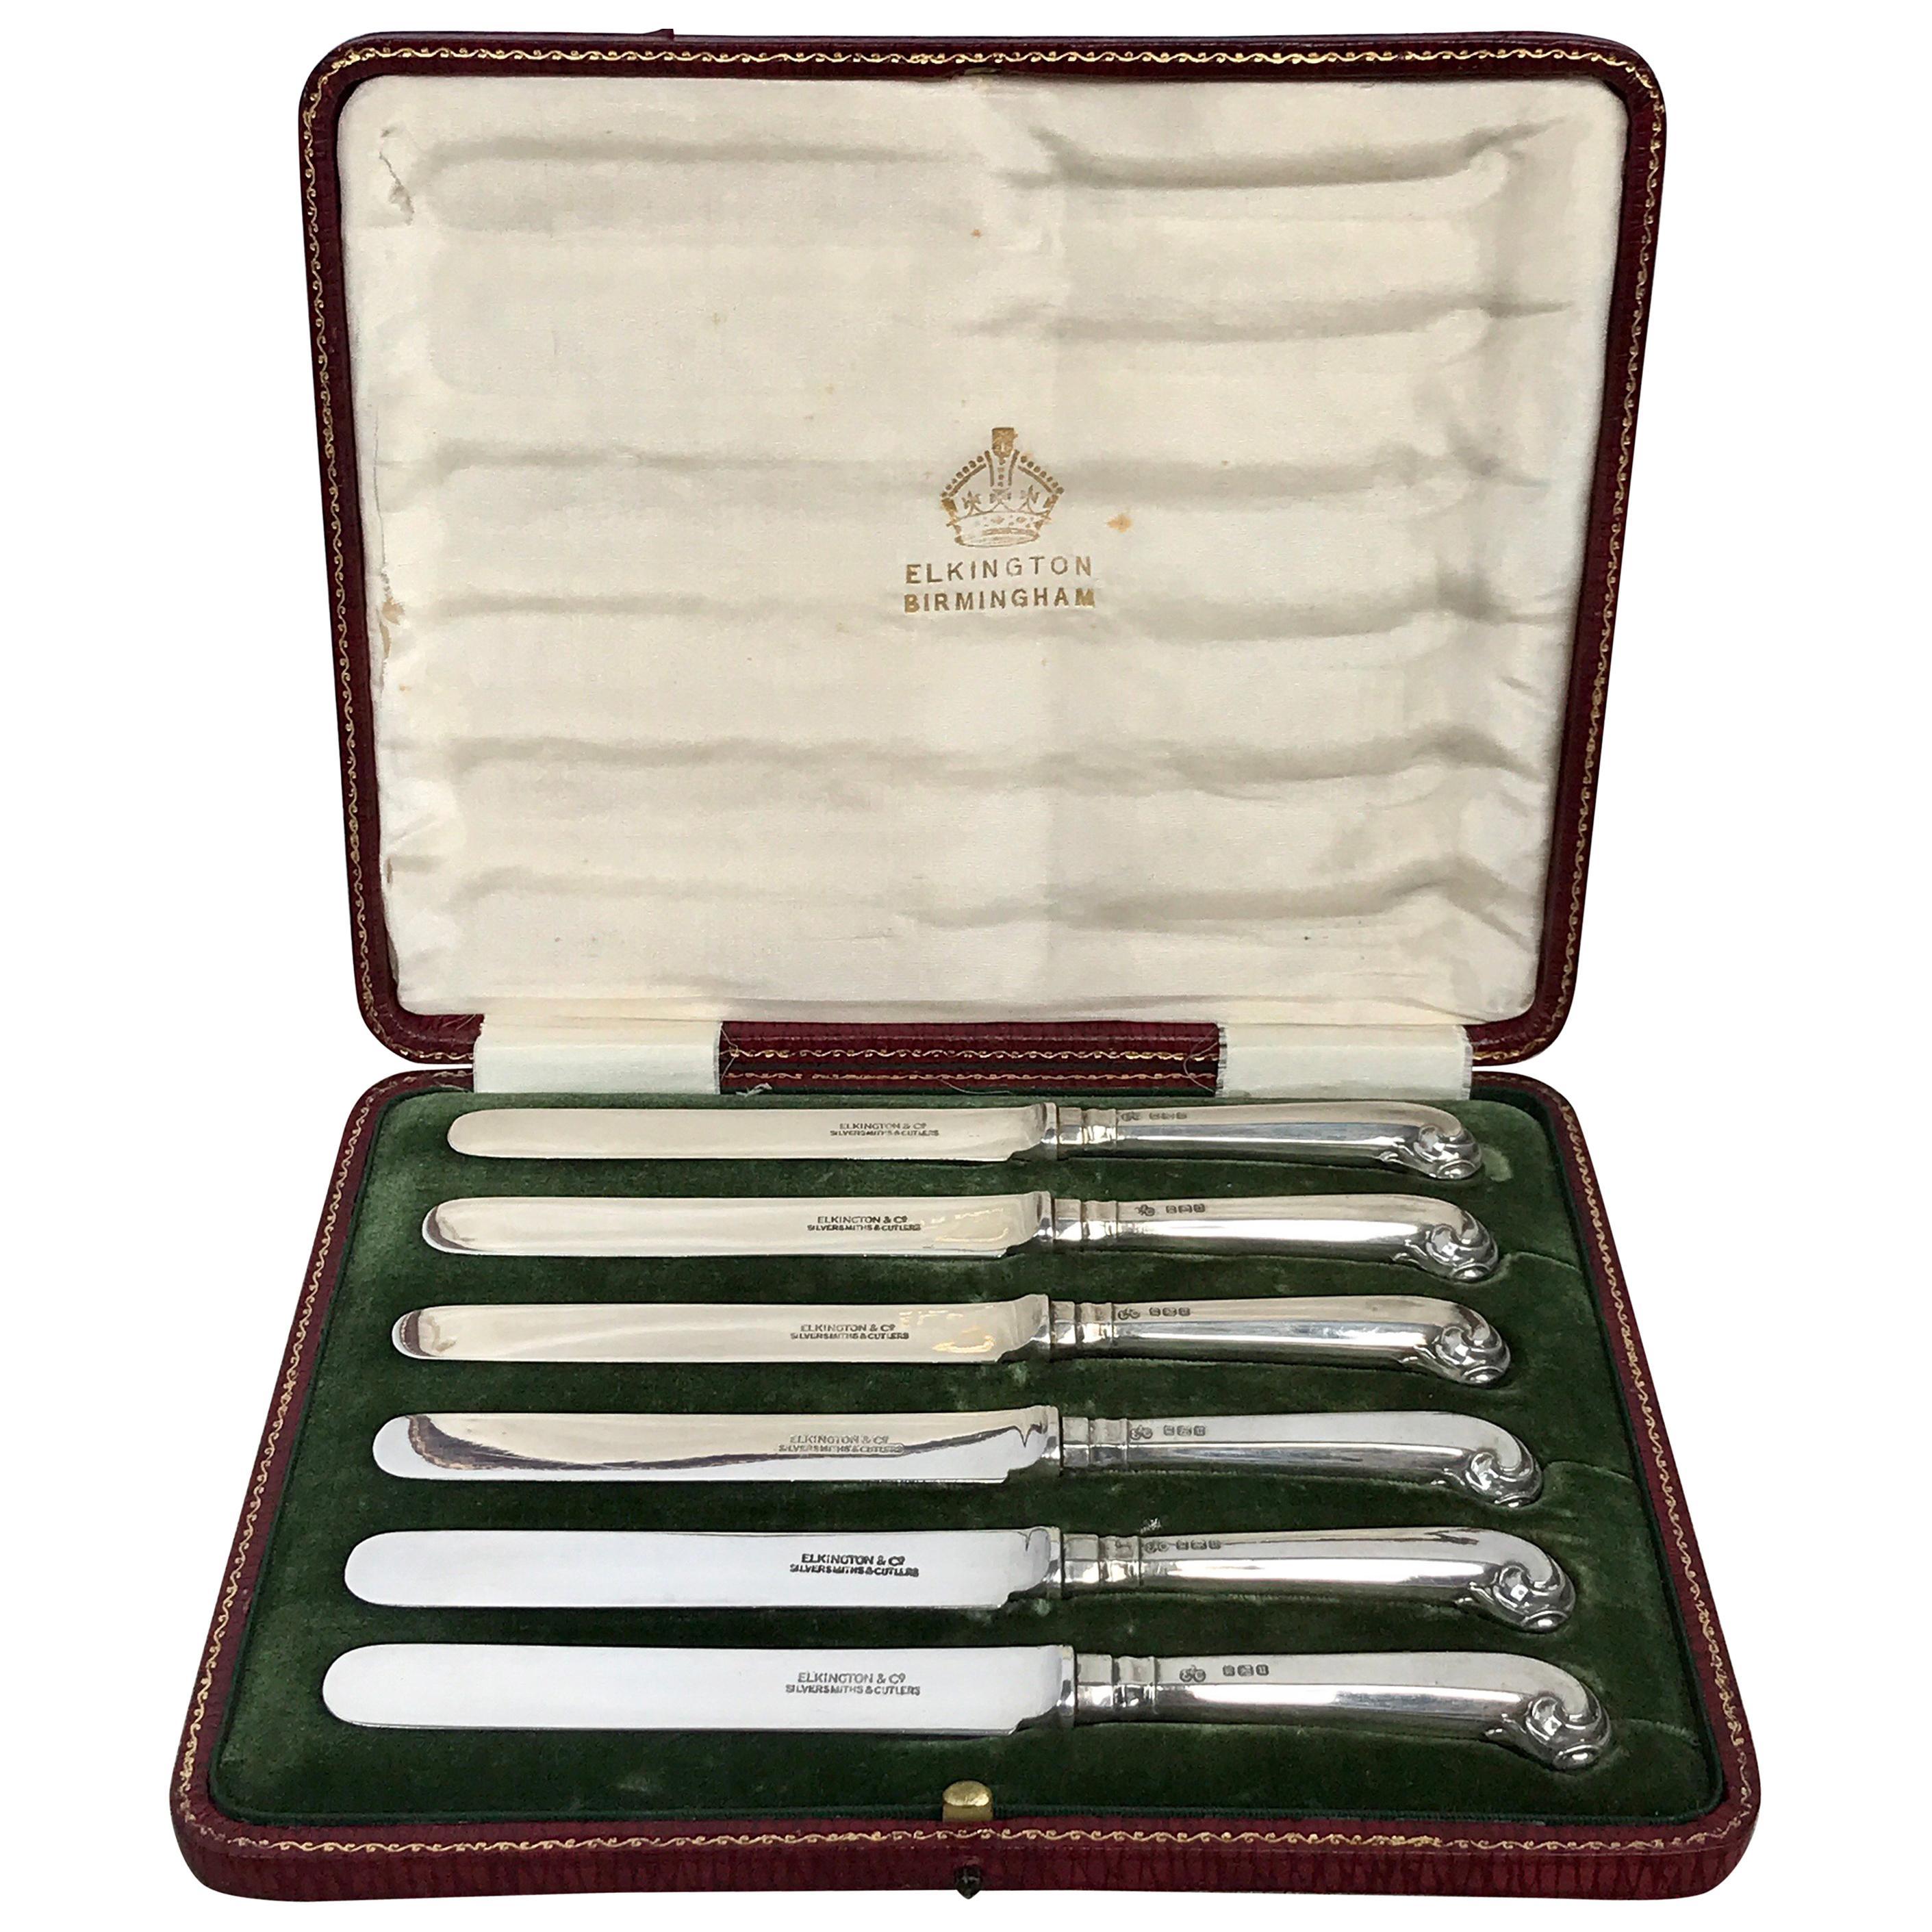 Elkington Sterling Pistol Handled Dessert Knives, with Original Box